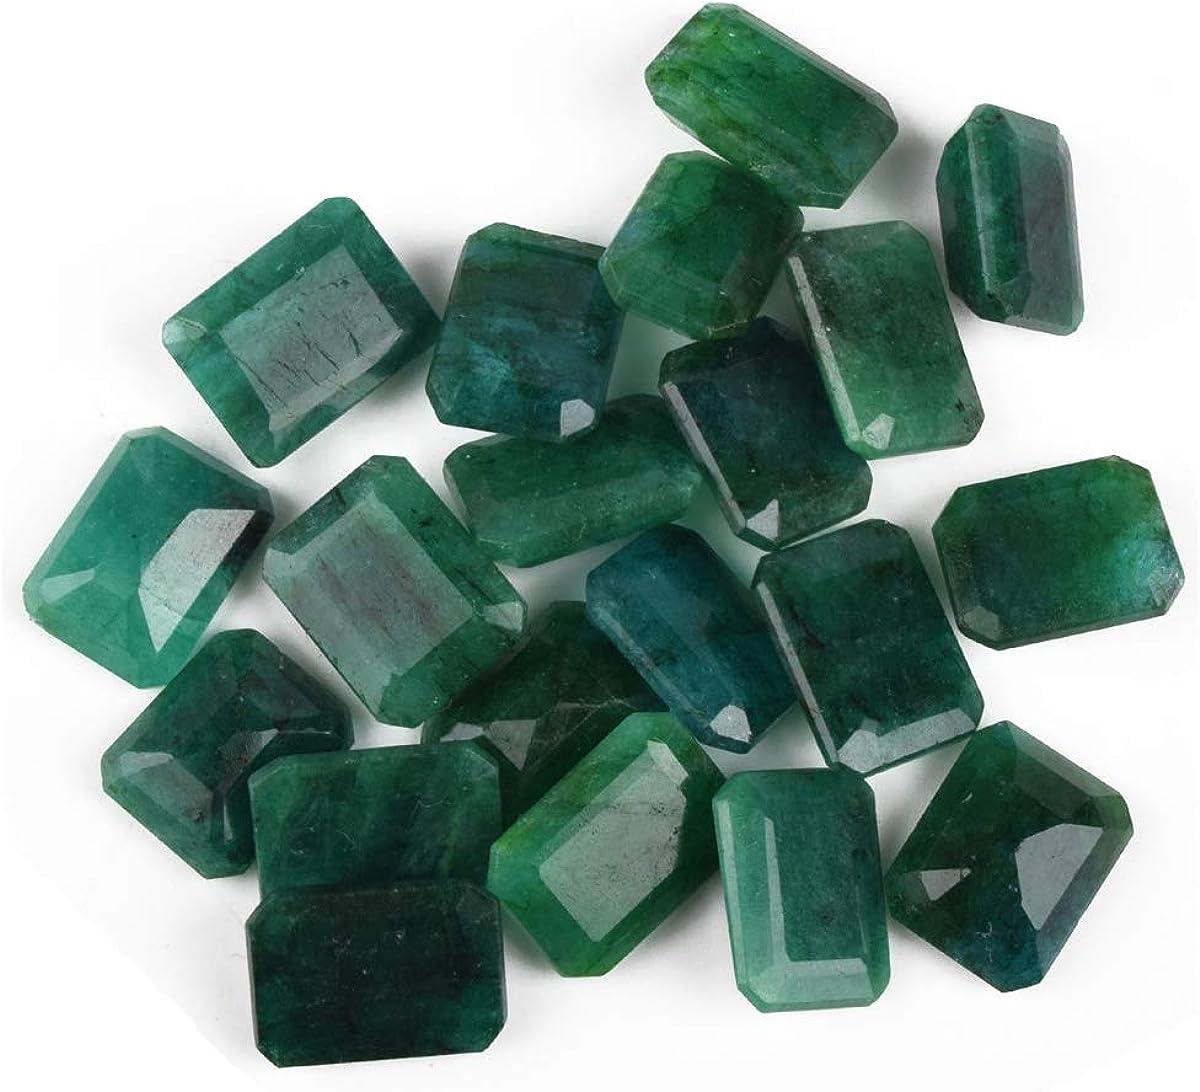 gemhub Zambian A+ Grade Green Emerald Approx 200 Cts. Fine 20 Pieces Natural Green Emerald Loose Gemstones Lot